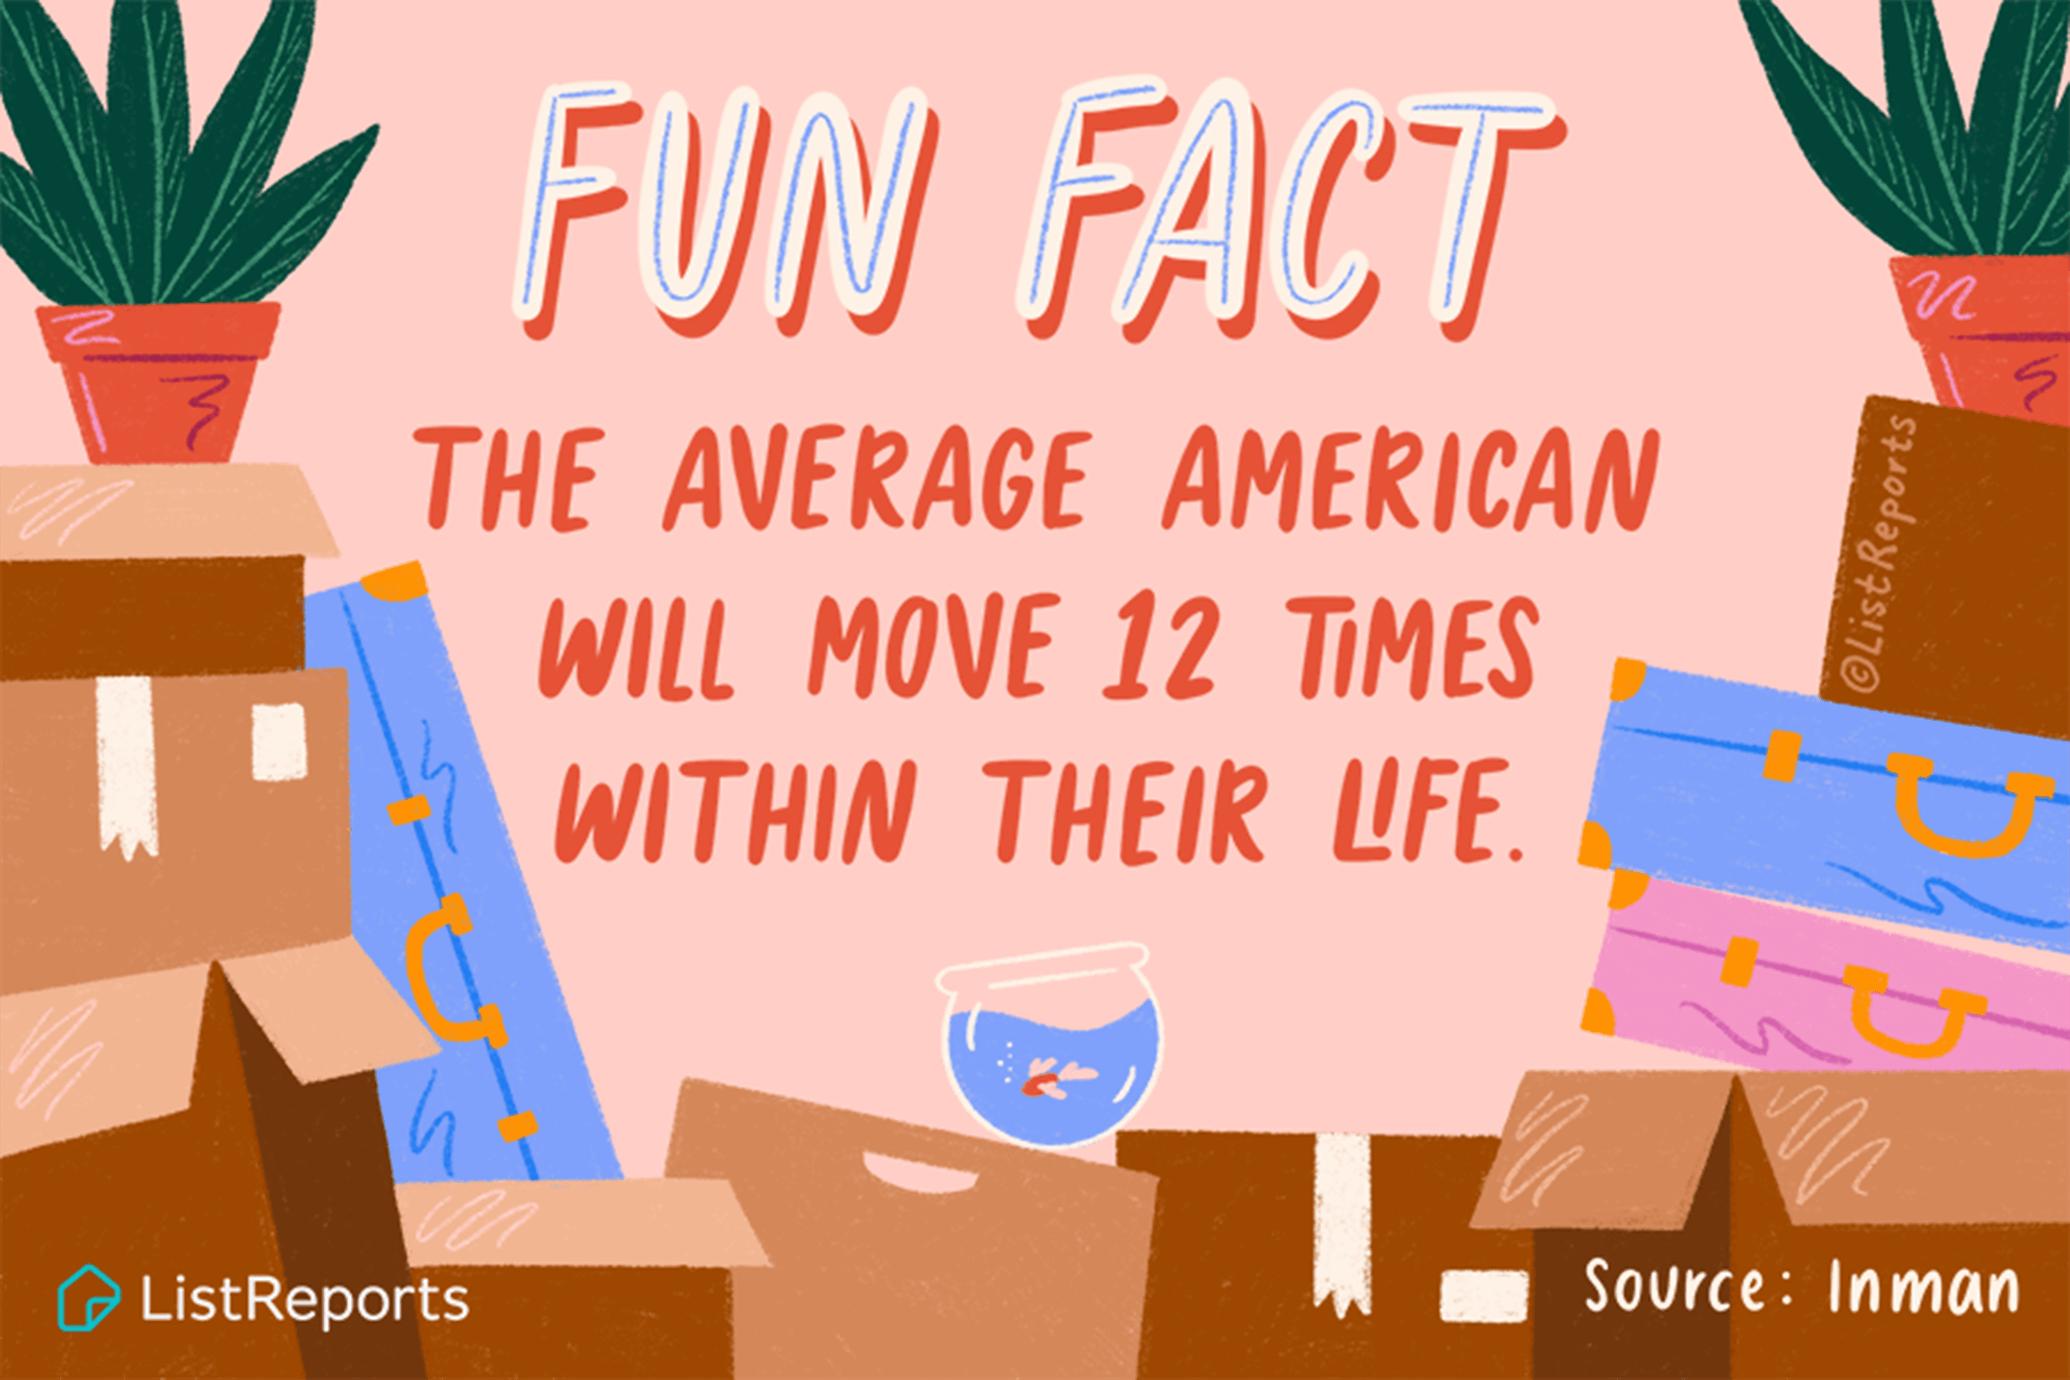 ListReports - Fun Fact